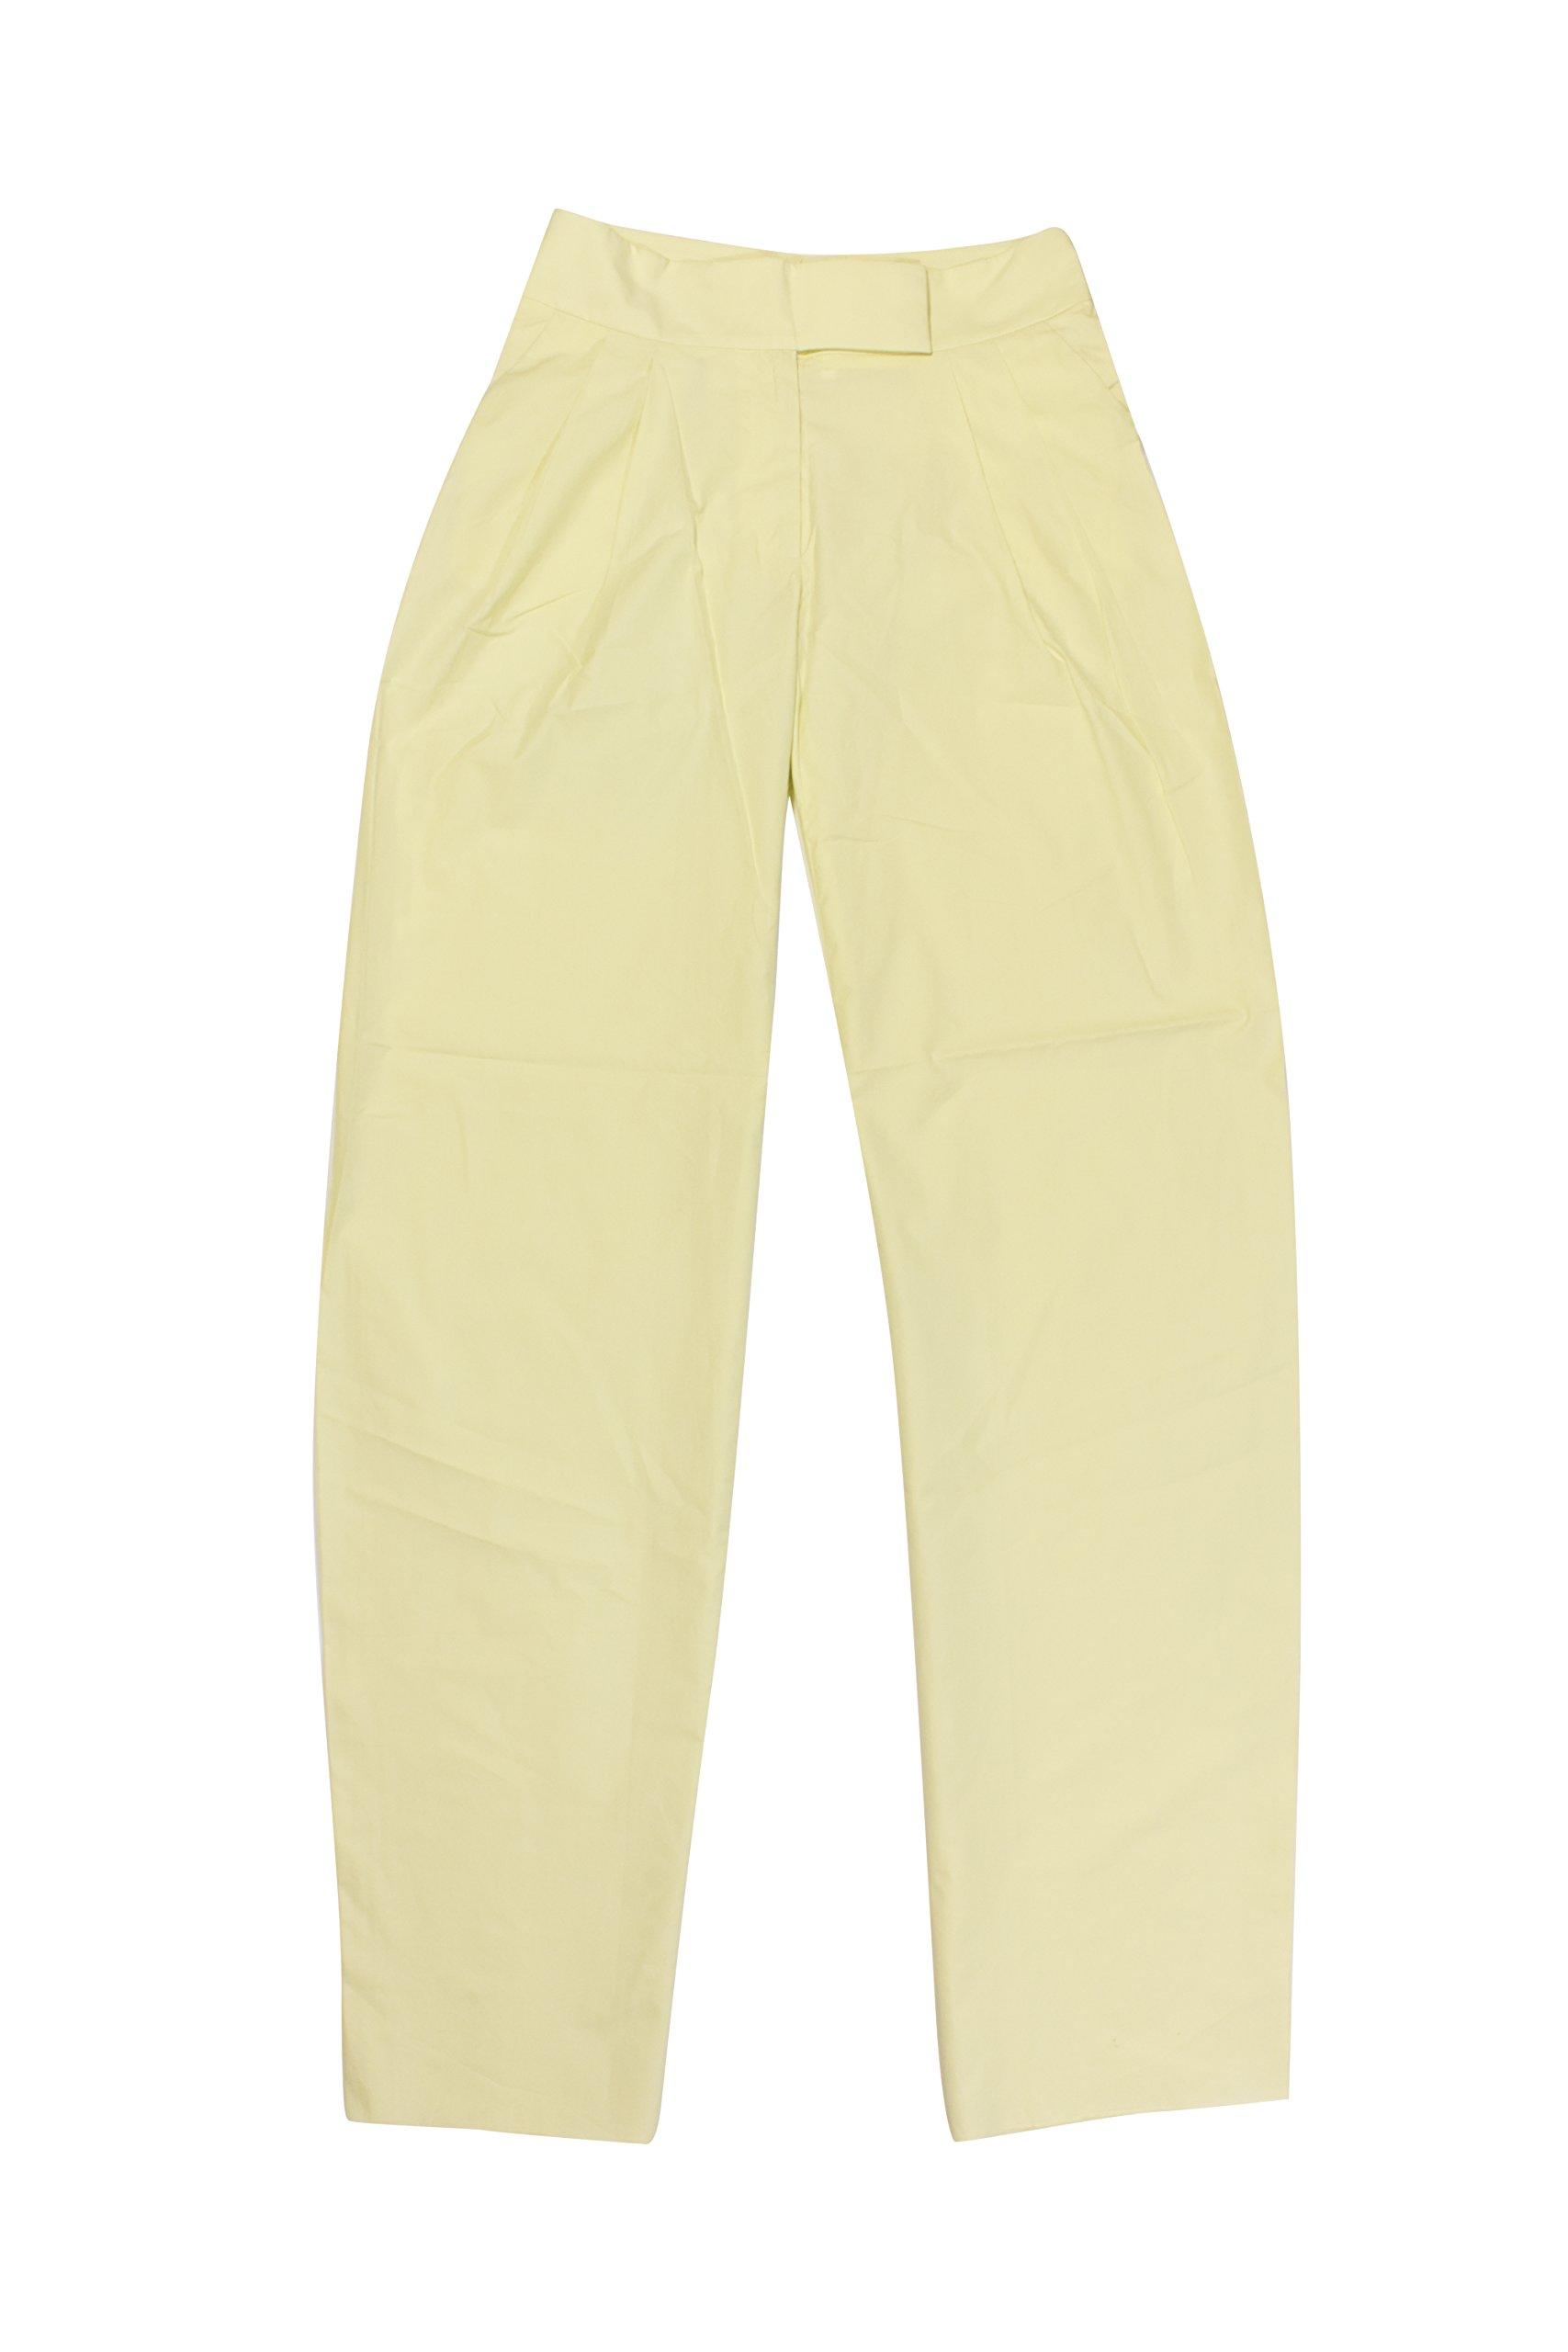 Salvatore Ferragamo Mint Green High Waist Pleated Pants 38